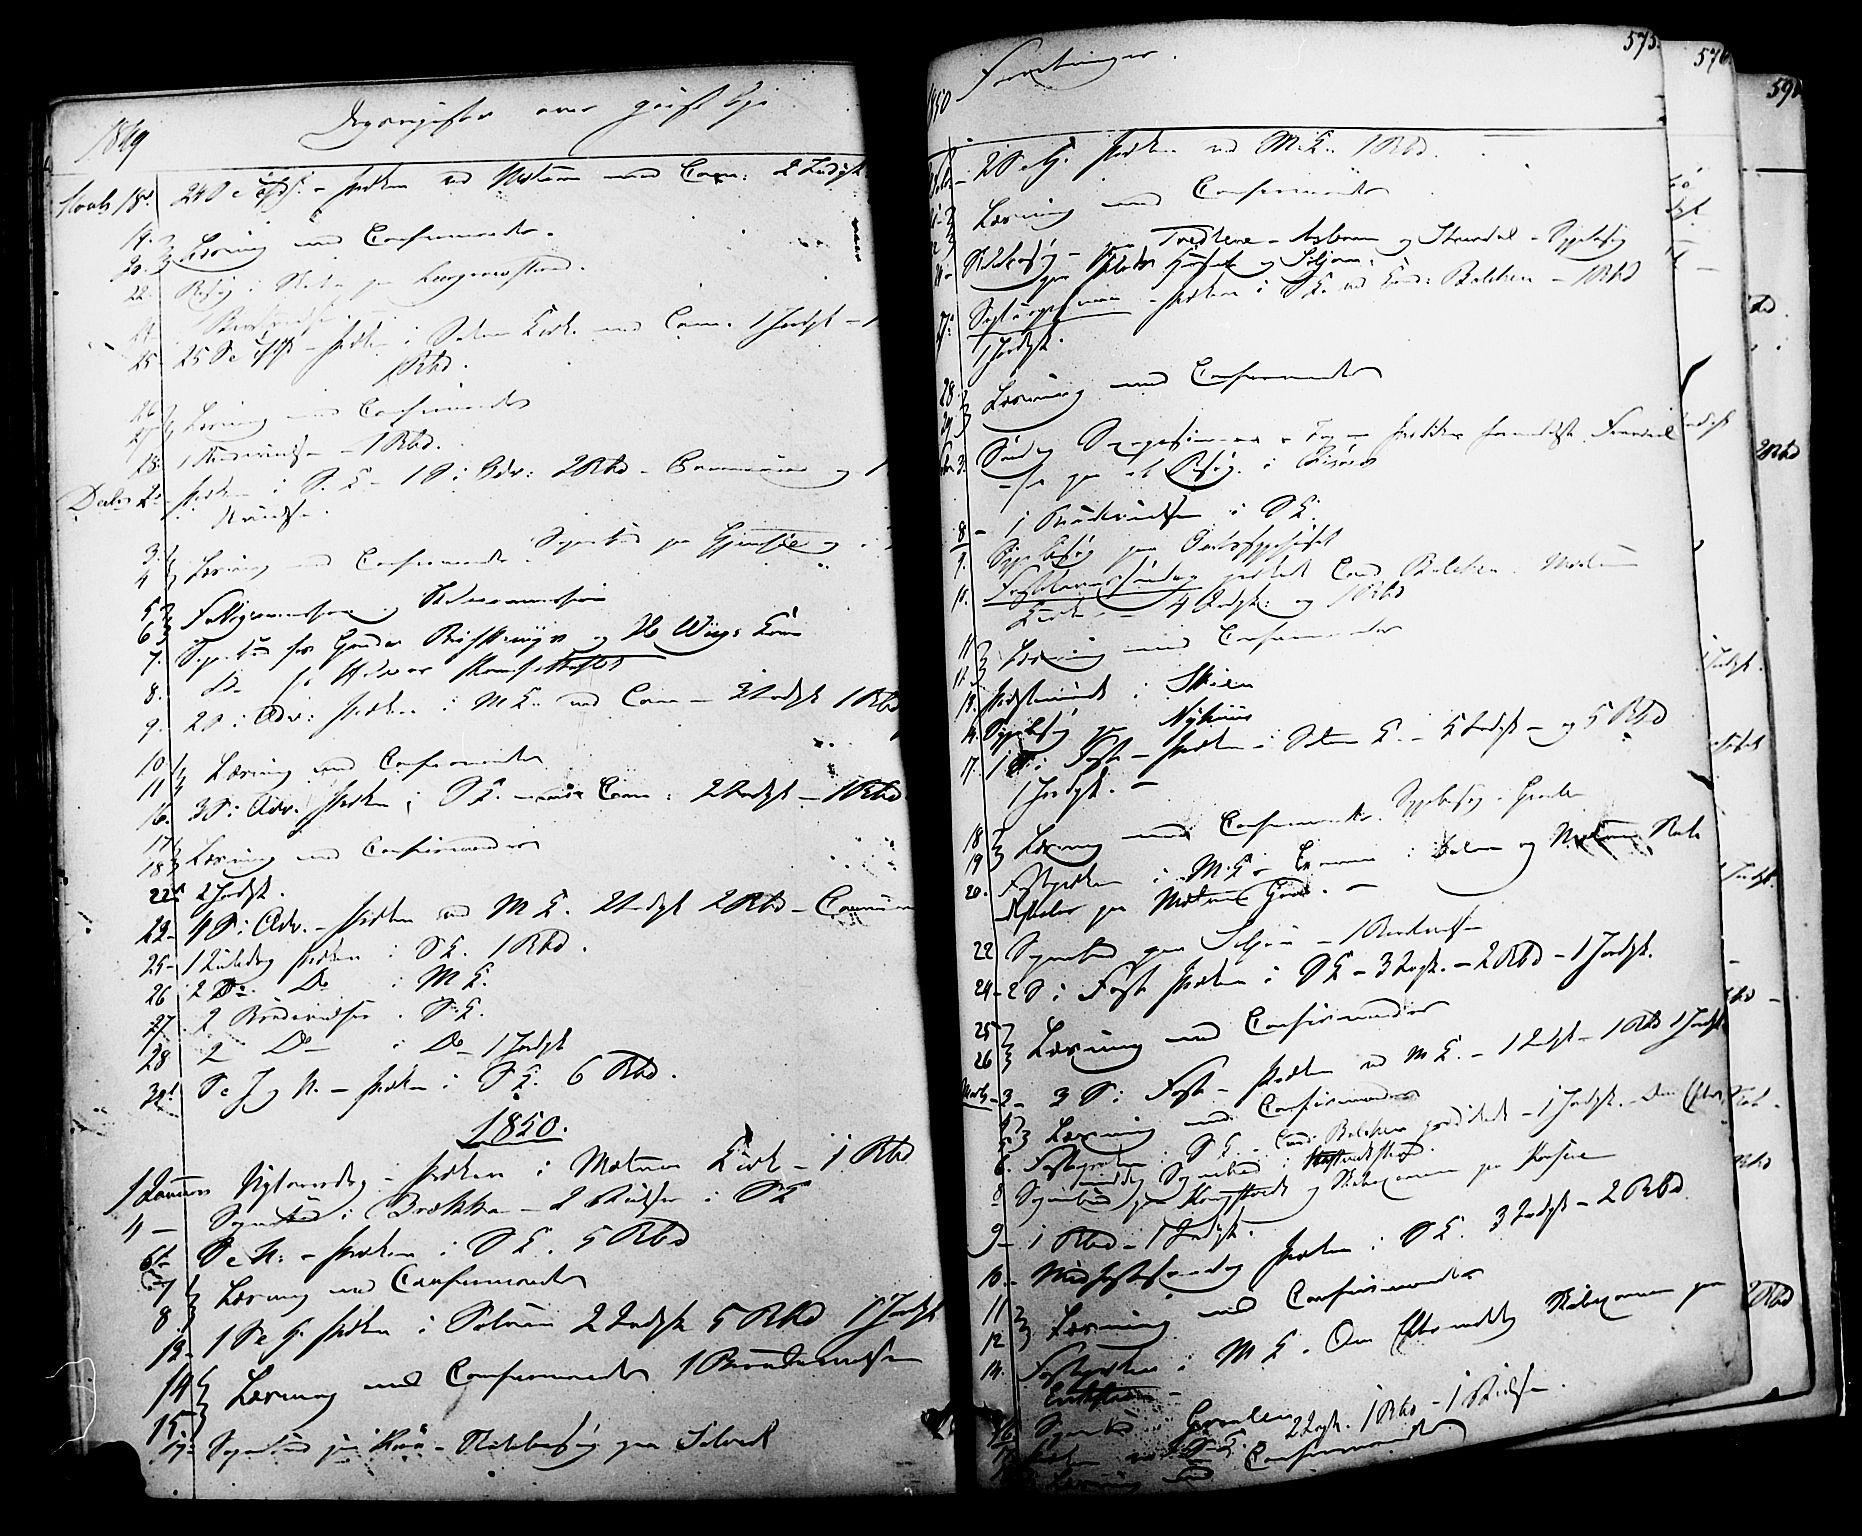 SAKO, Solum kirkebøker, F/Fa/L0006: Ministerialbok nr. I 6, 1844-1855, s. 575